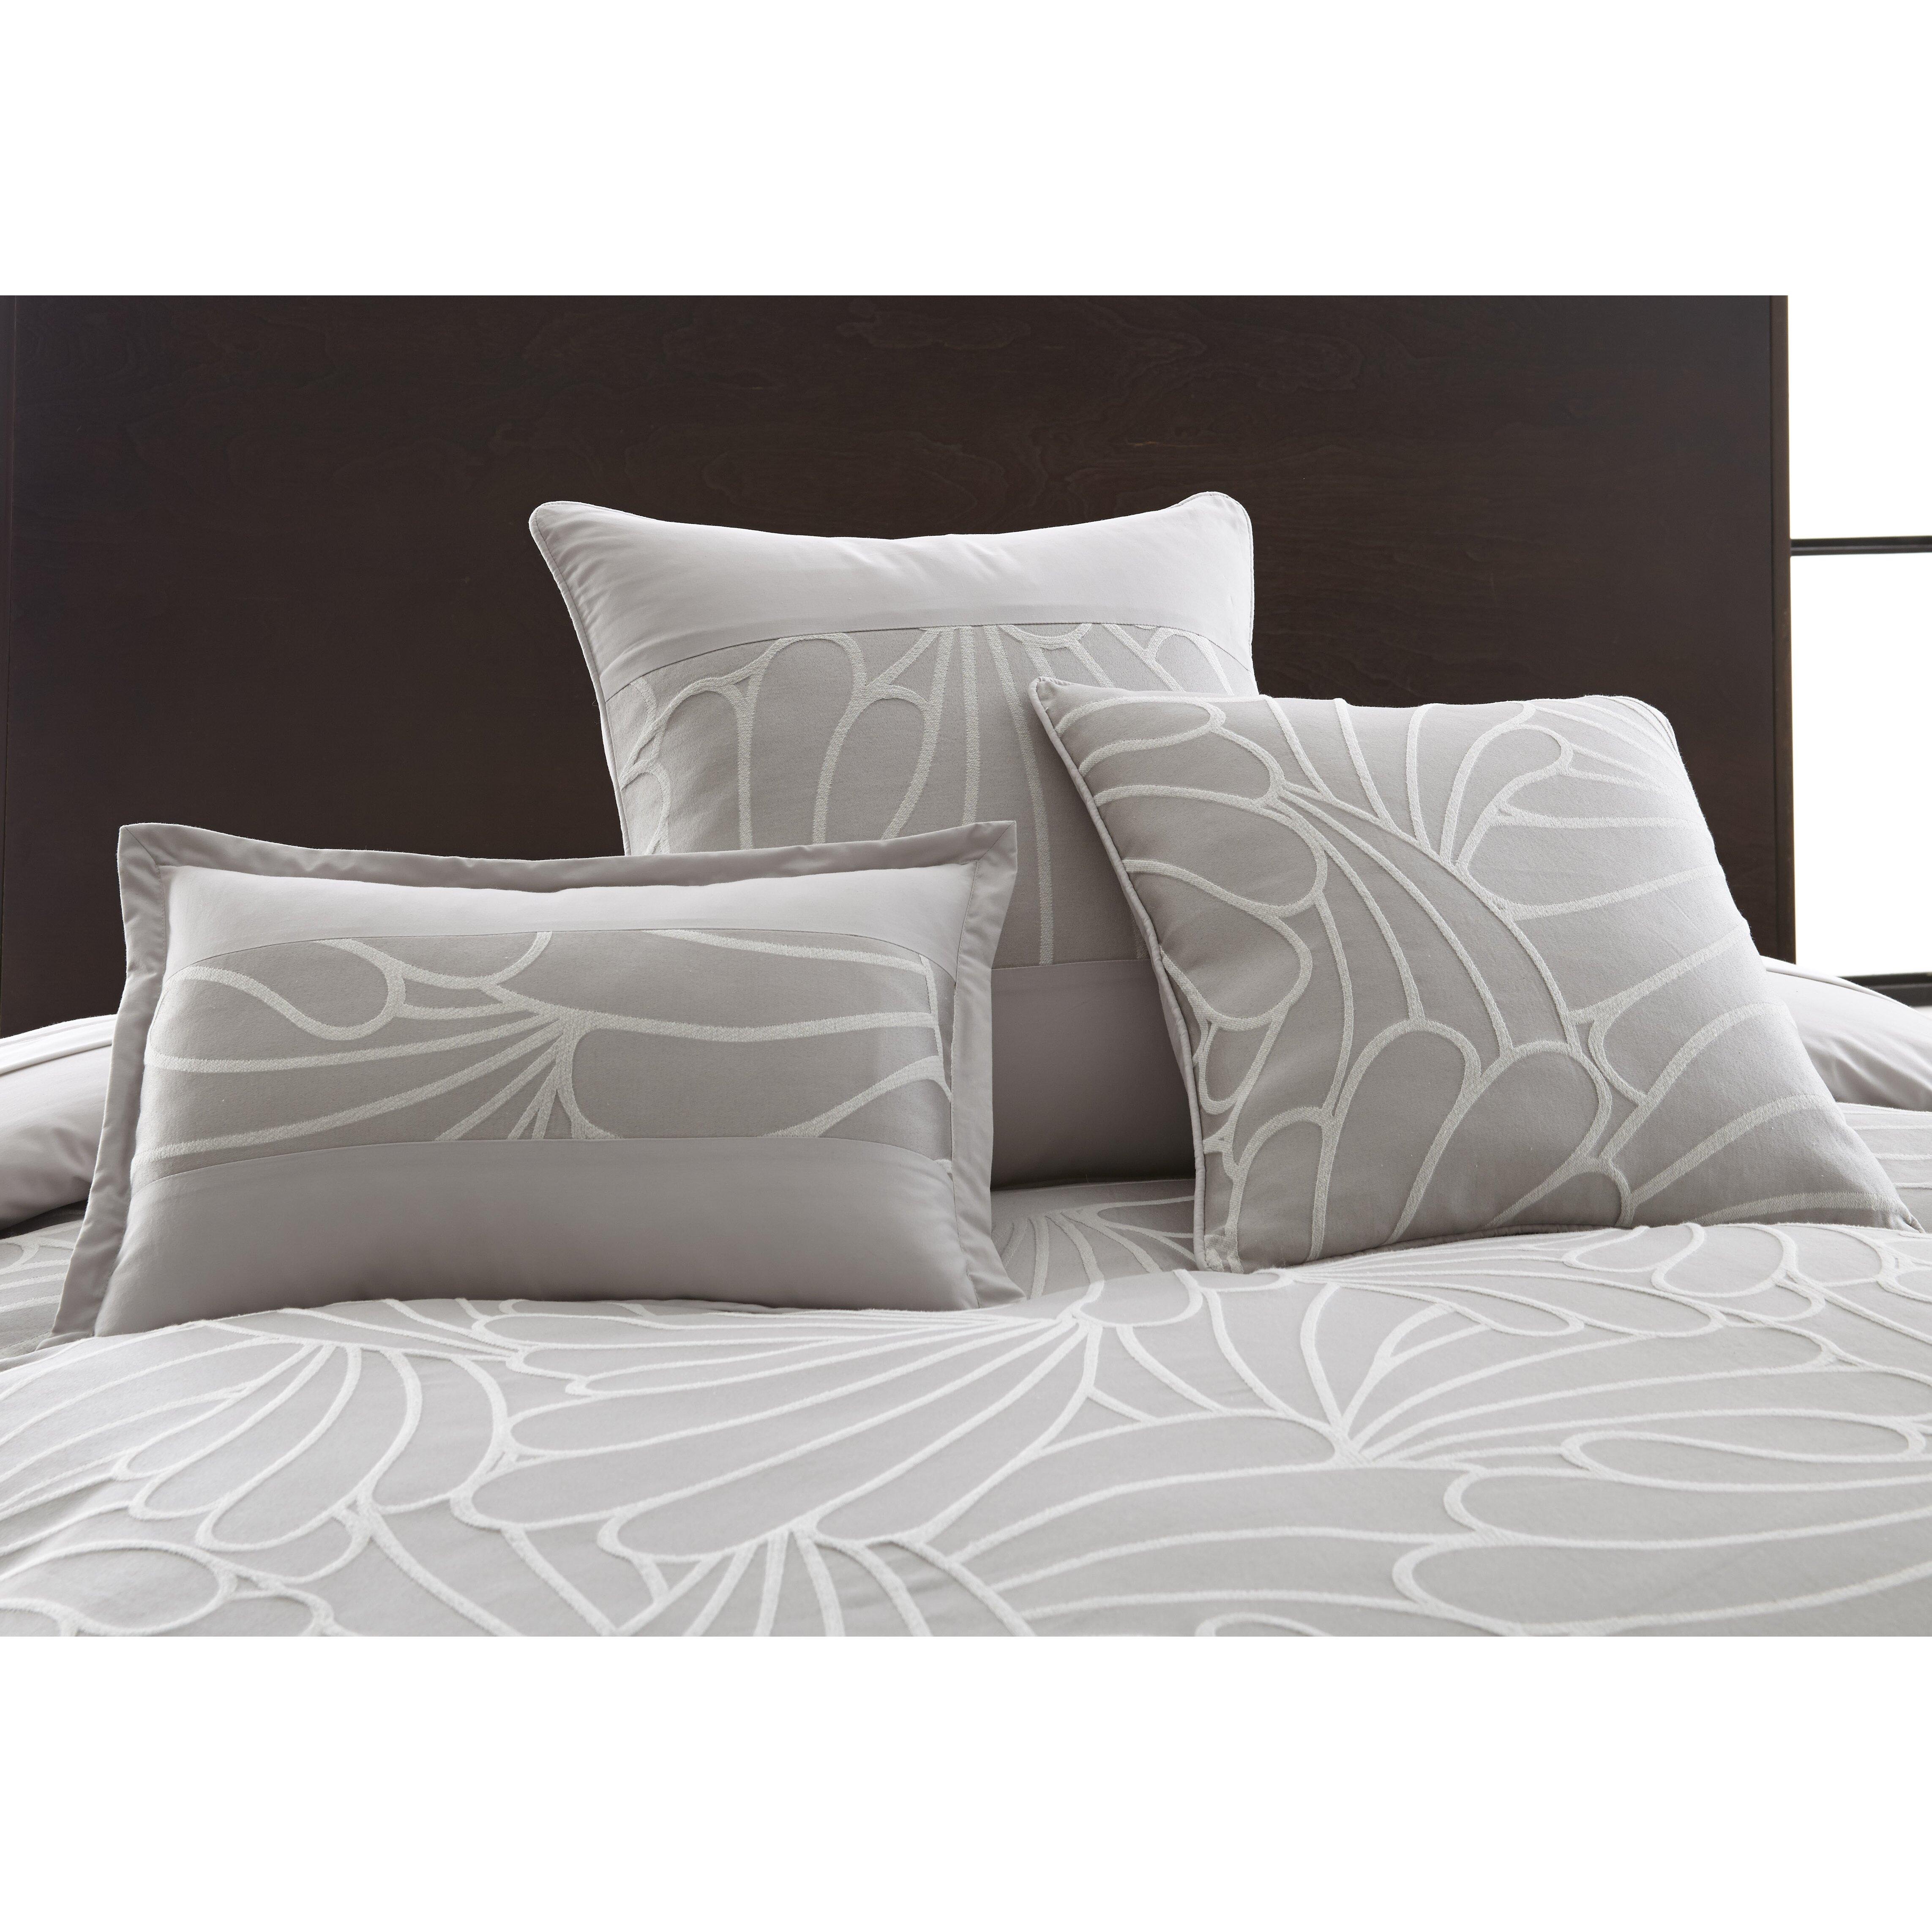 Amrapur Mandalay Bay 3 Piece Kate Jacquard Decorative Cotton Breakfast and Throw Pillow Set ...